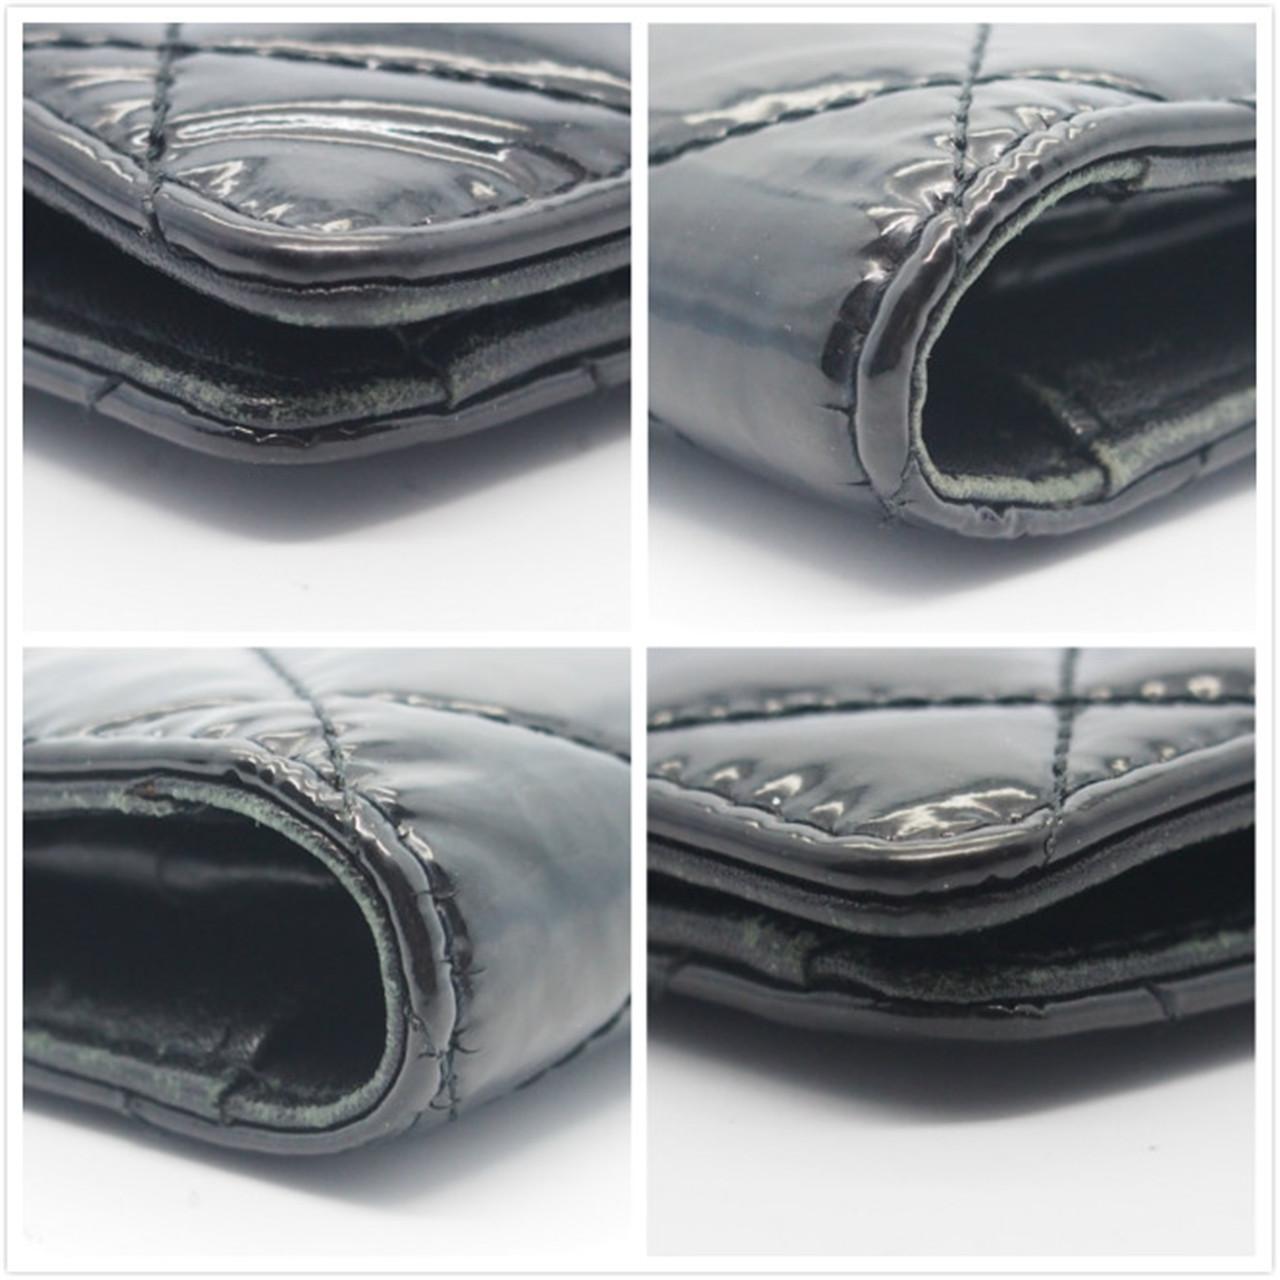 ec1a755ca69c Authentic CHANEL Black Quilted Patent Leather Brilliant L Yen Holder Wallet